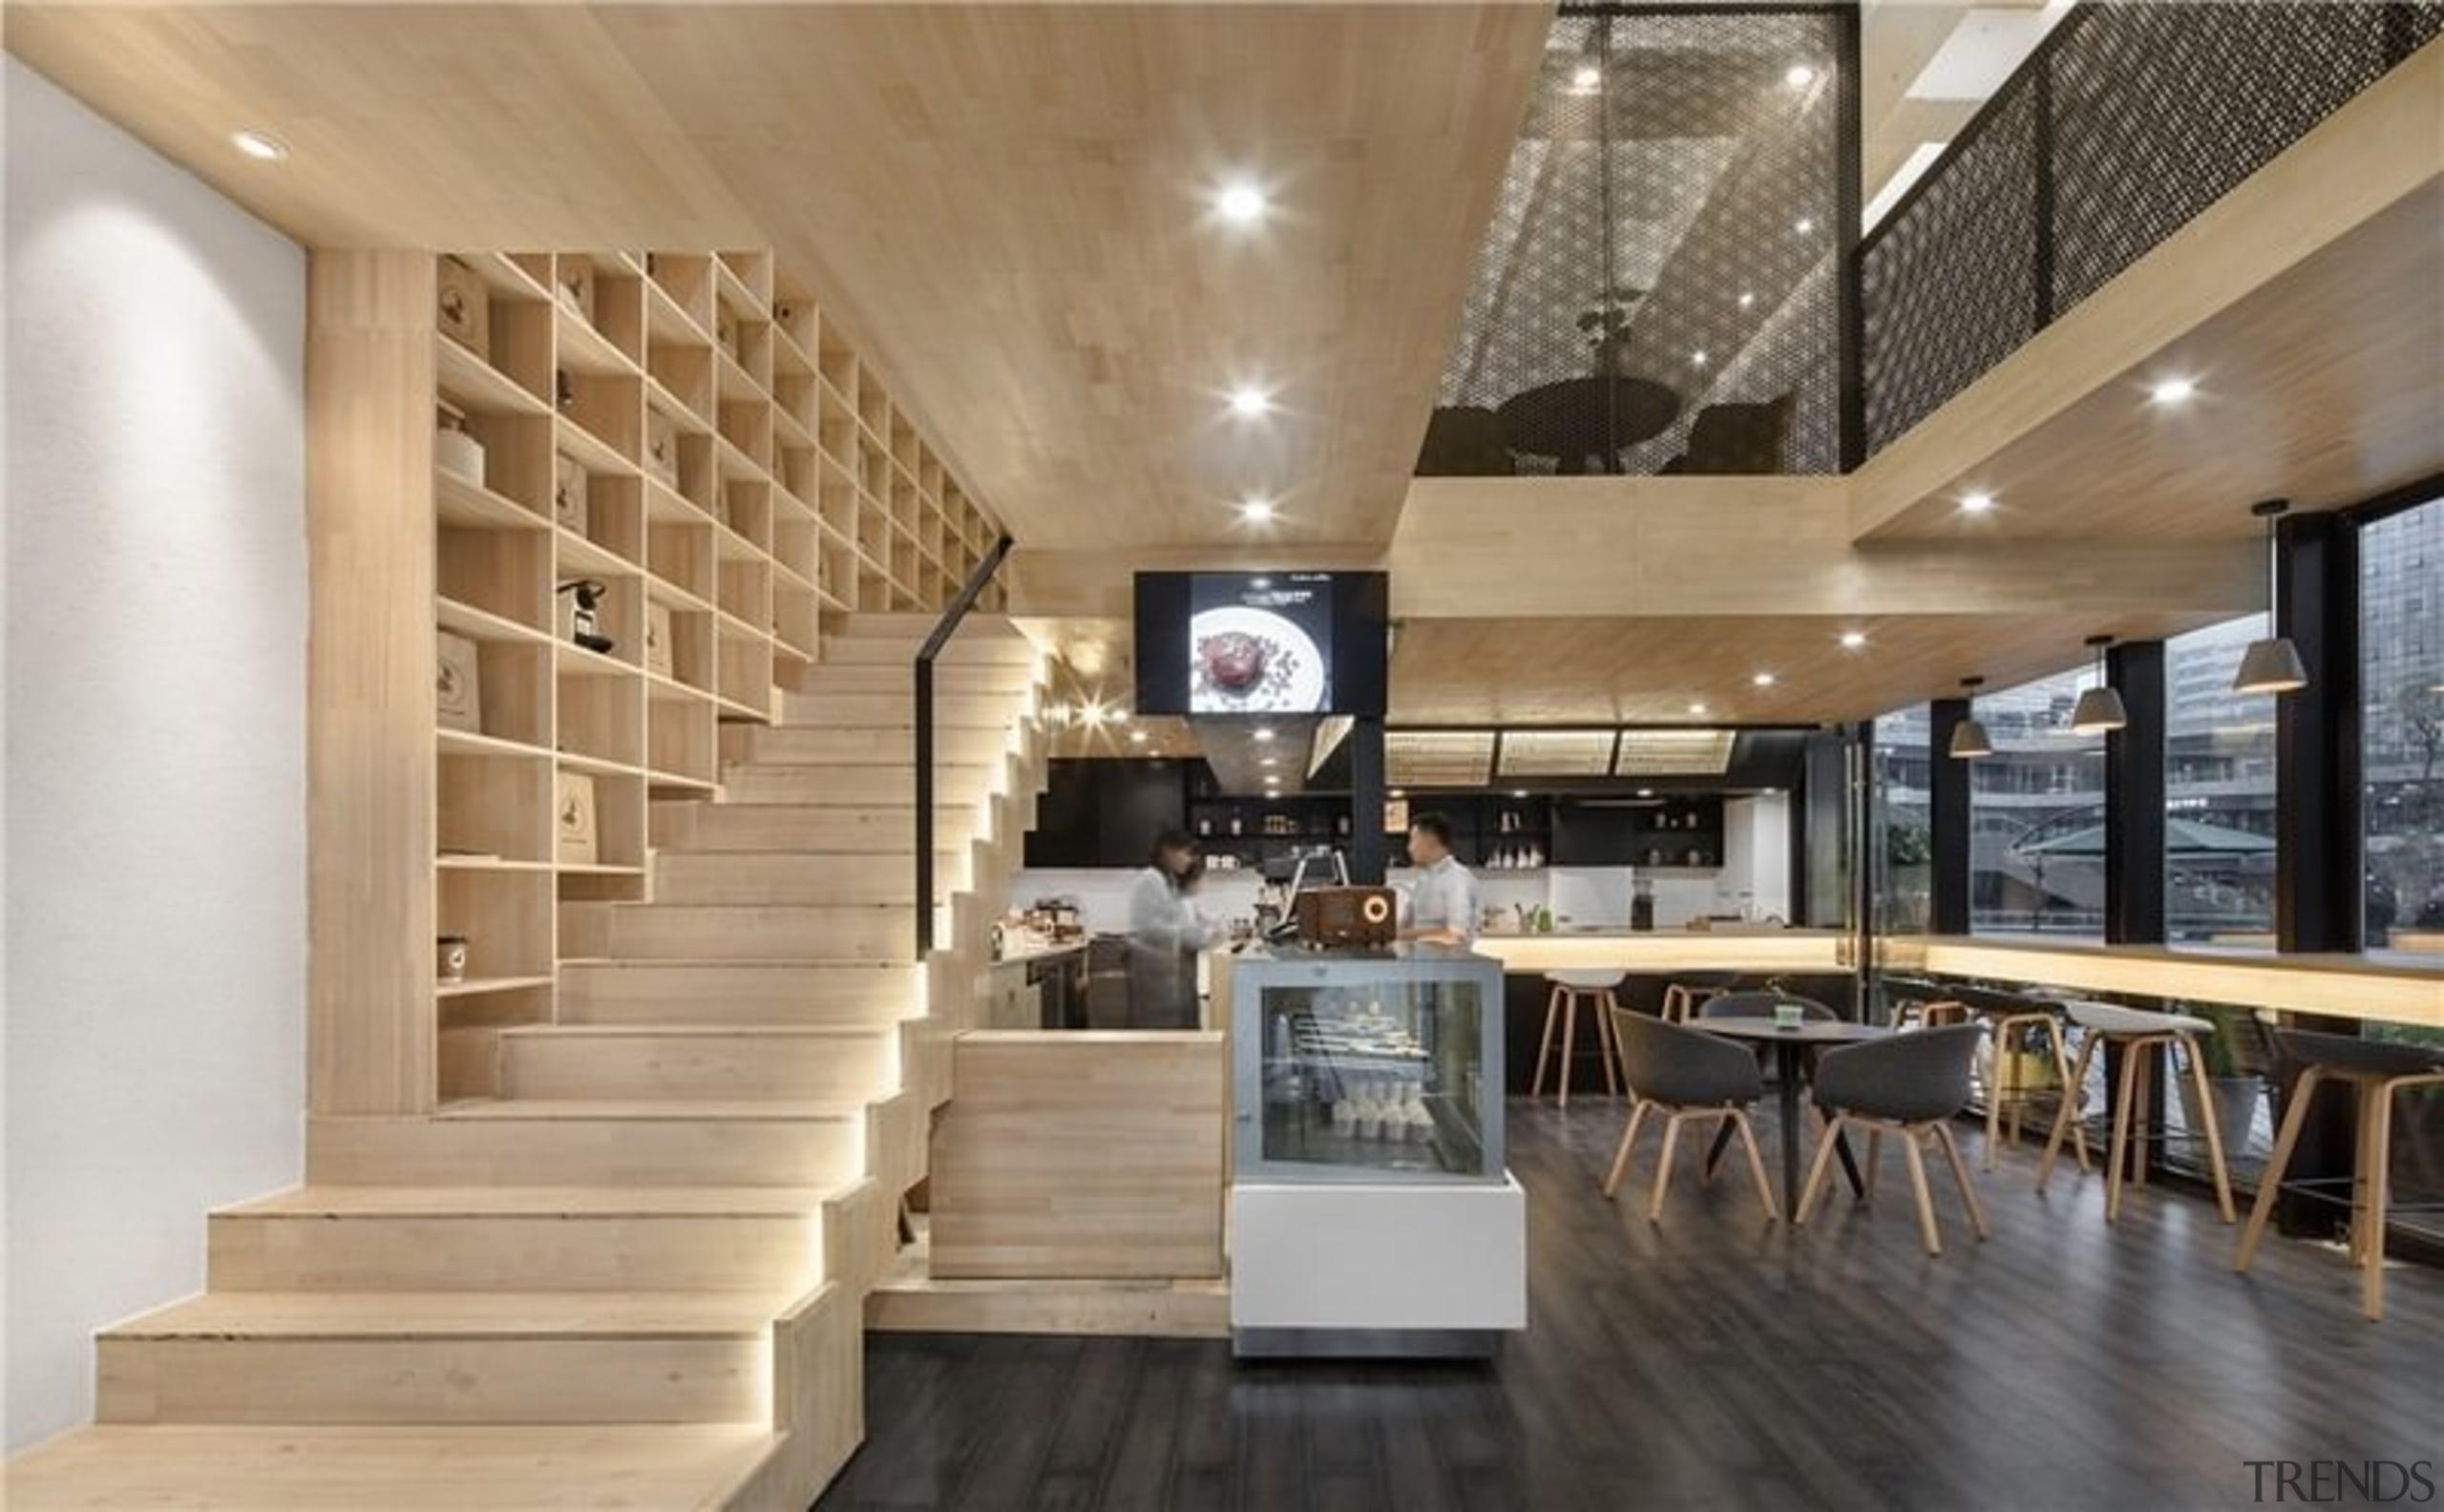 Recessed lighting runs along the stairway - Recessed ceiling, flooring, interior design, lobby, gray, brown